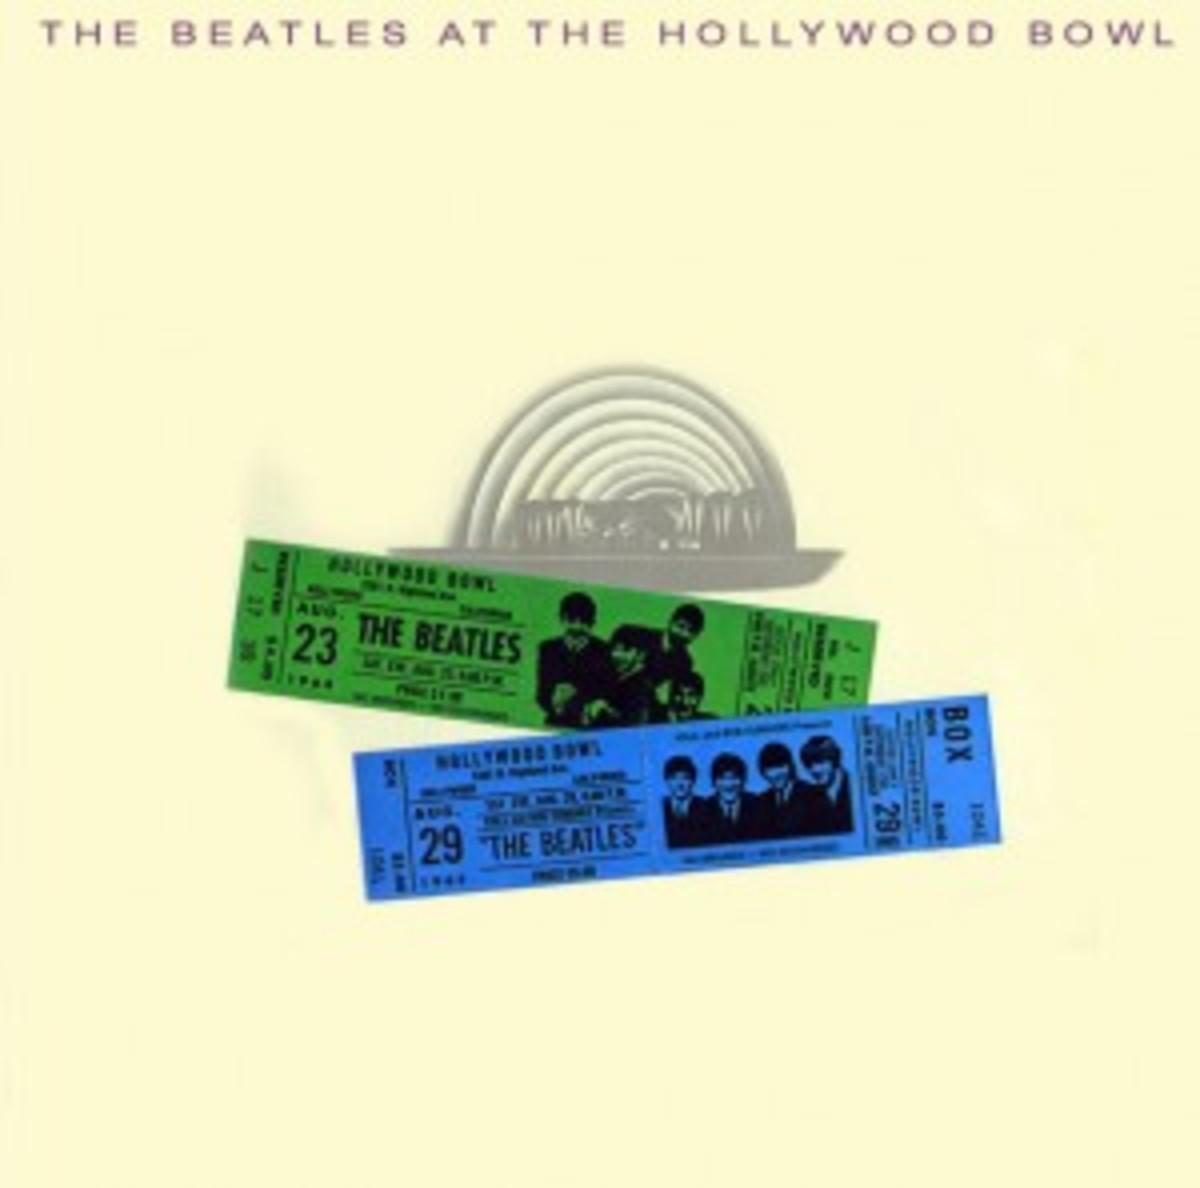 The Beatles At The Hollywood Bowl